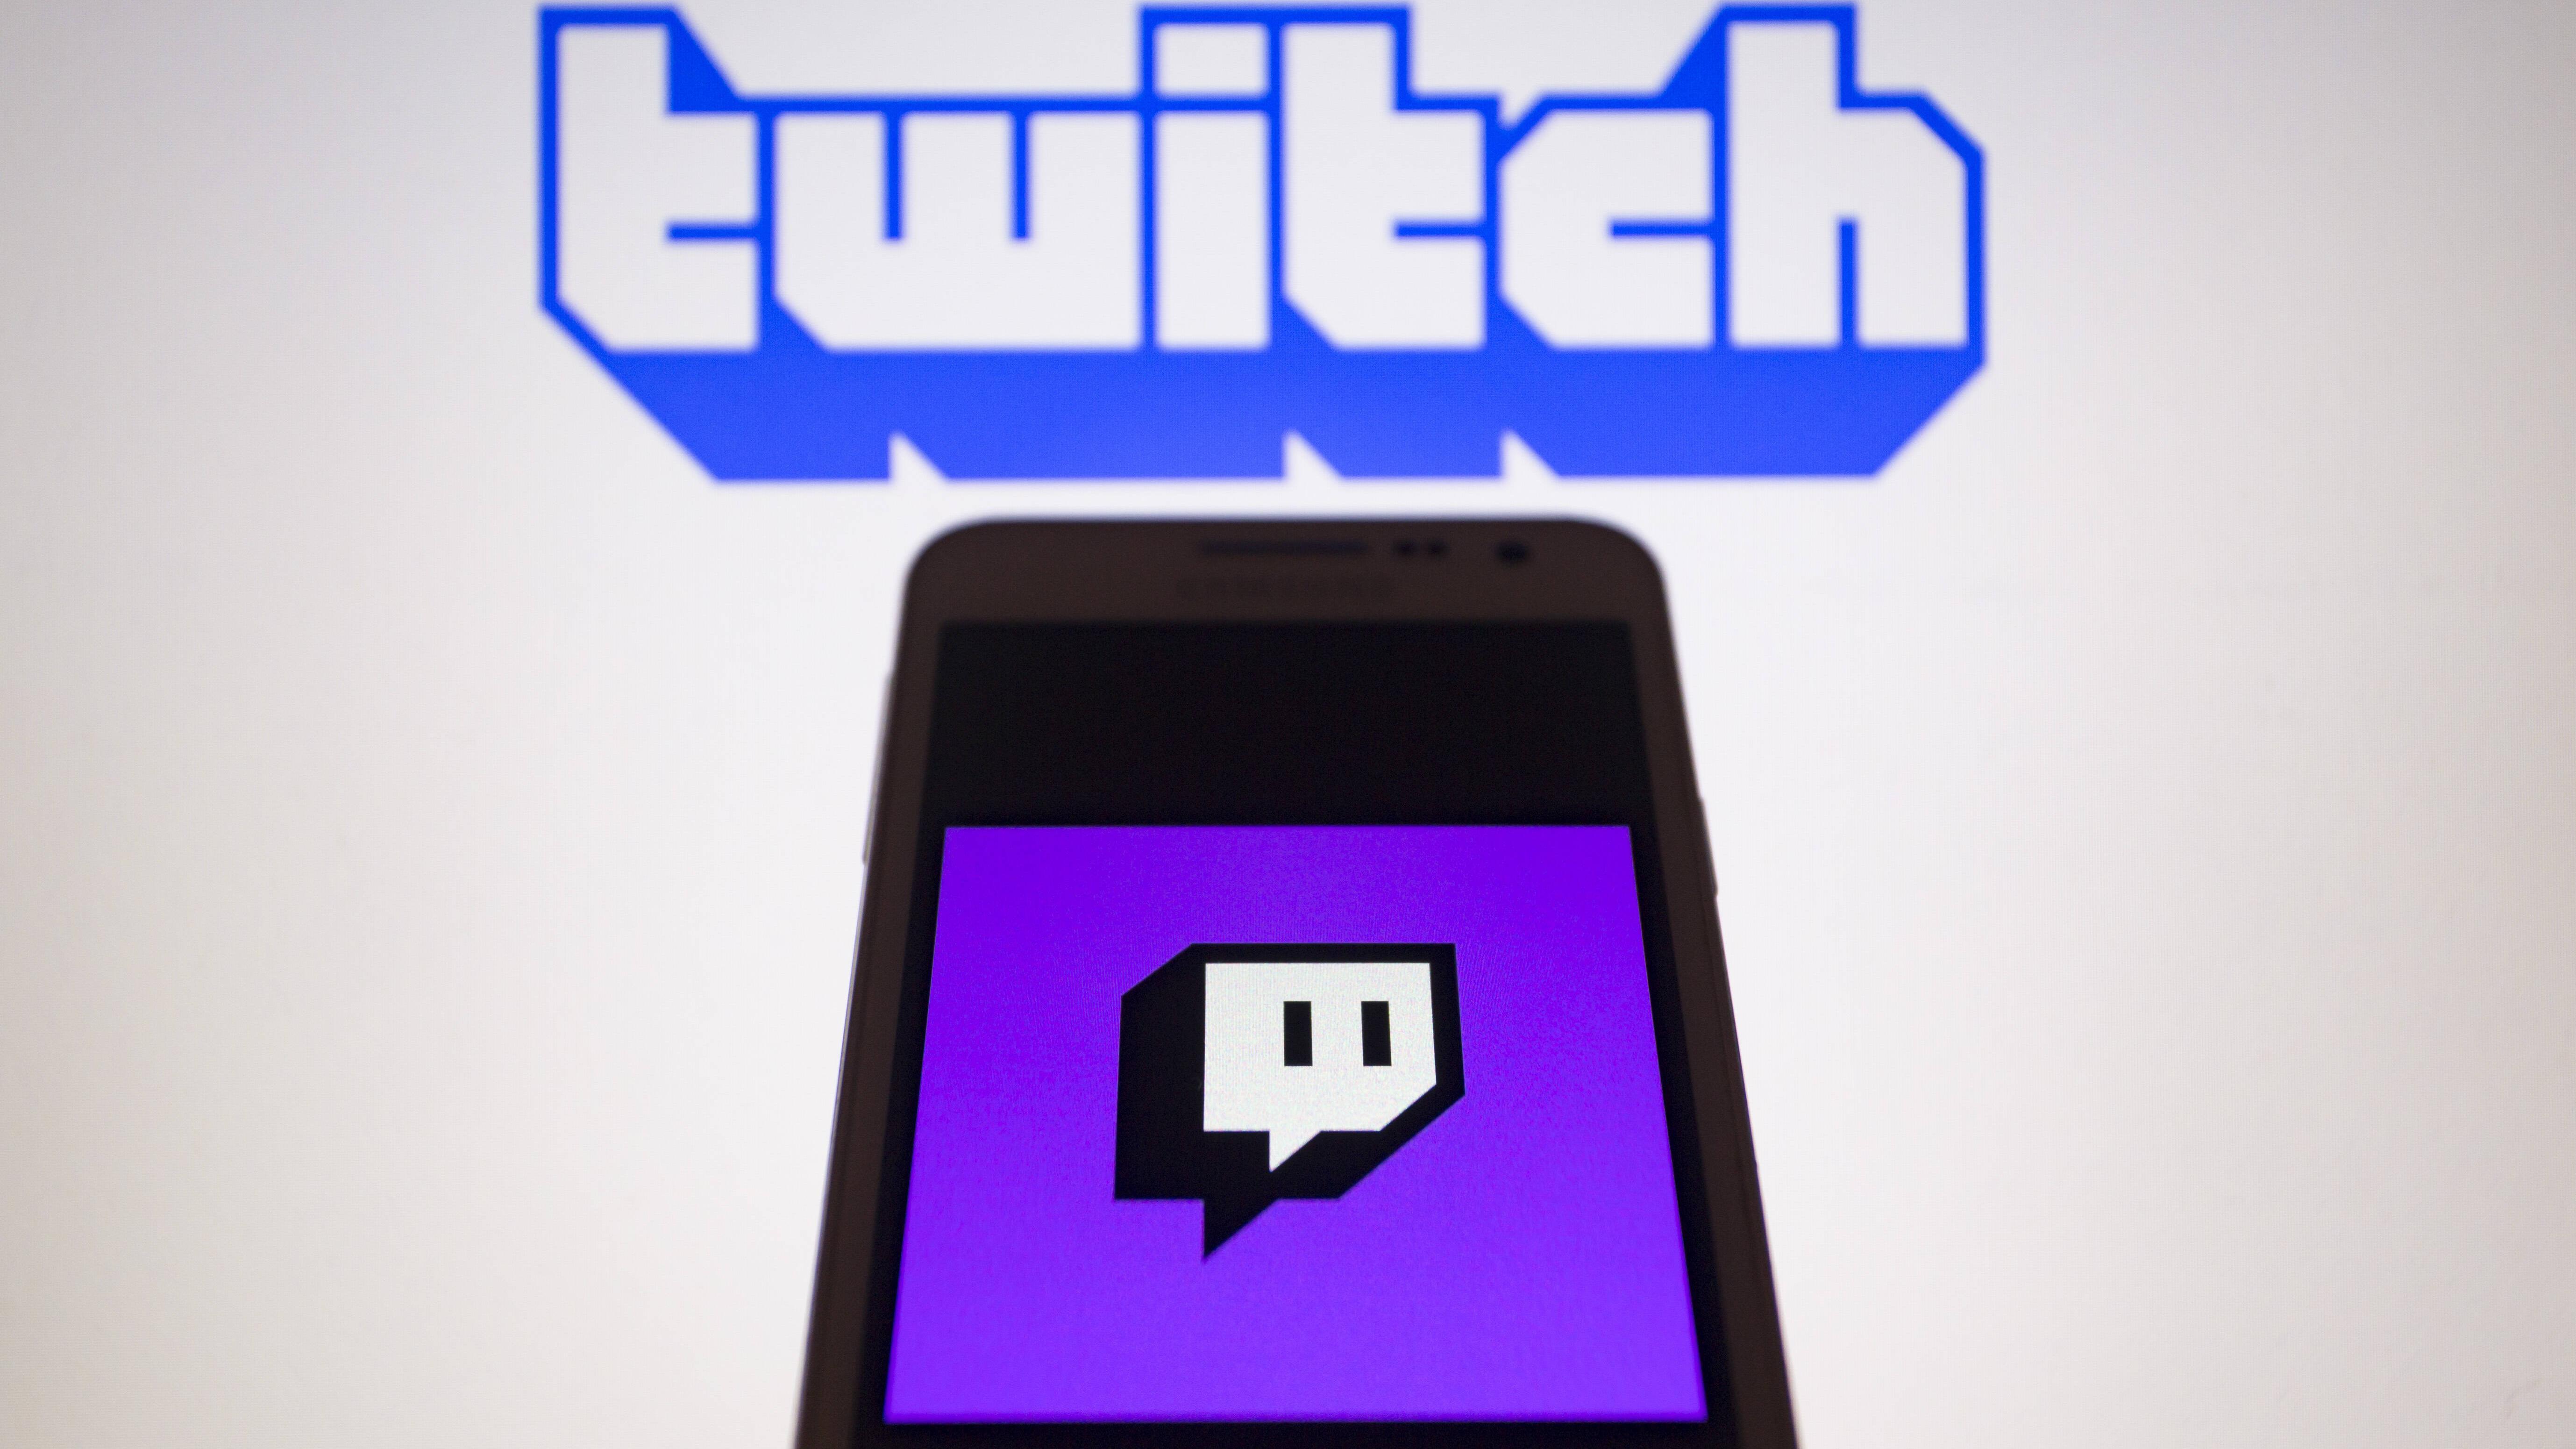 Earlicking ASMR: Das steckt hinter dem Twitch-Trend